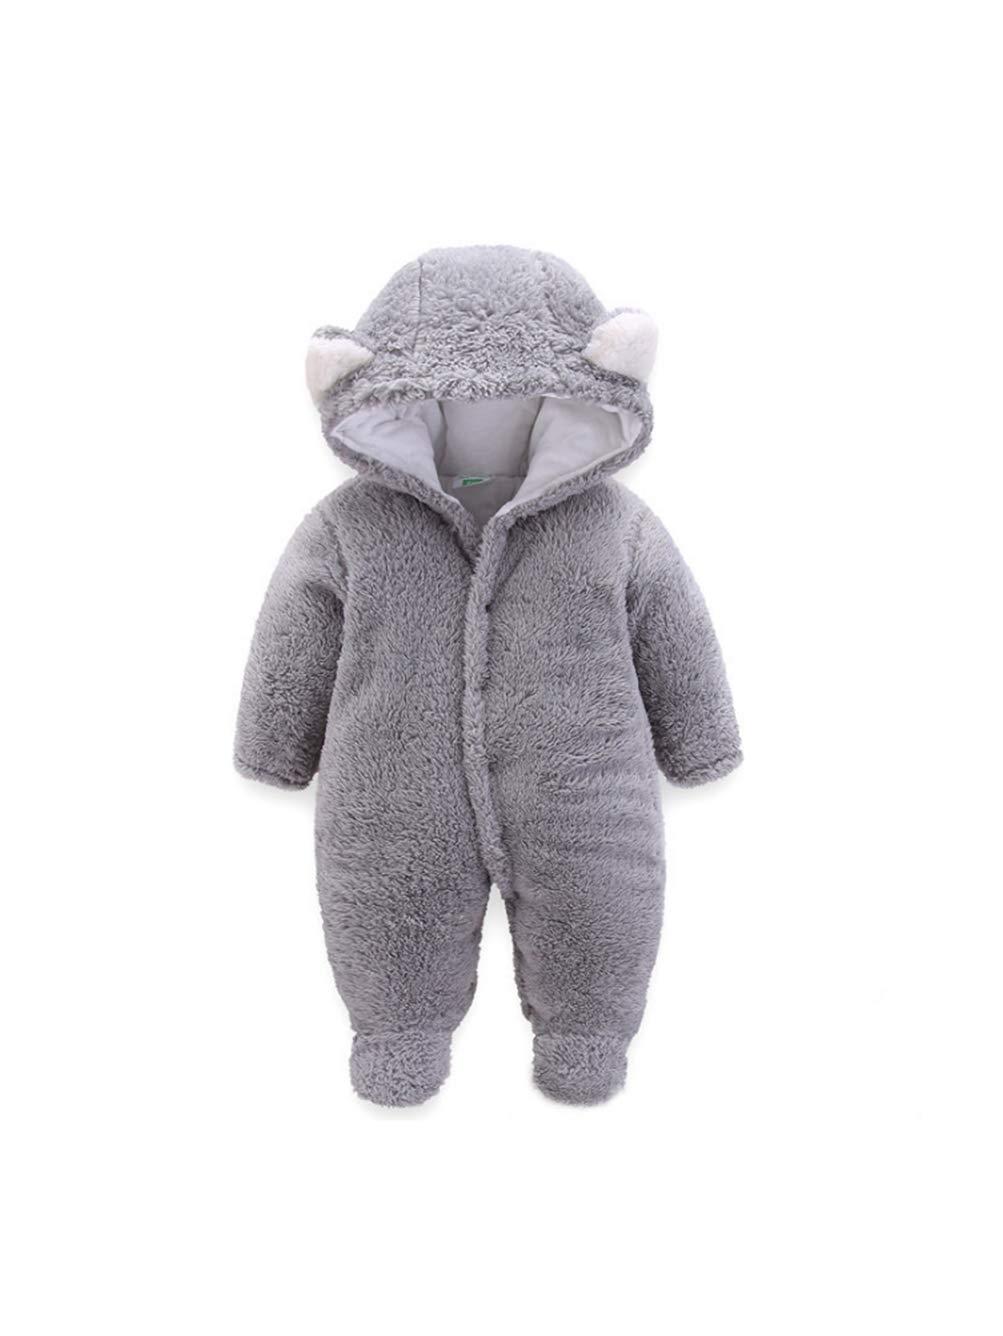 iChunhua Unisex Baby Newborn Wrap Cartoon Bear Snowsuit Thick Fleece Soft Footies Romper Jumpsuit